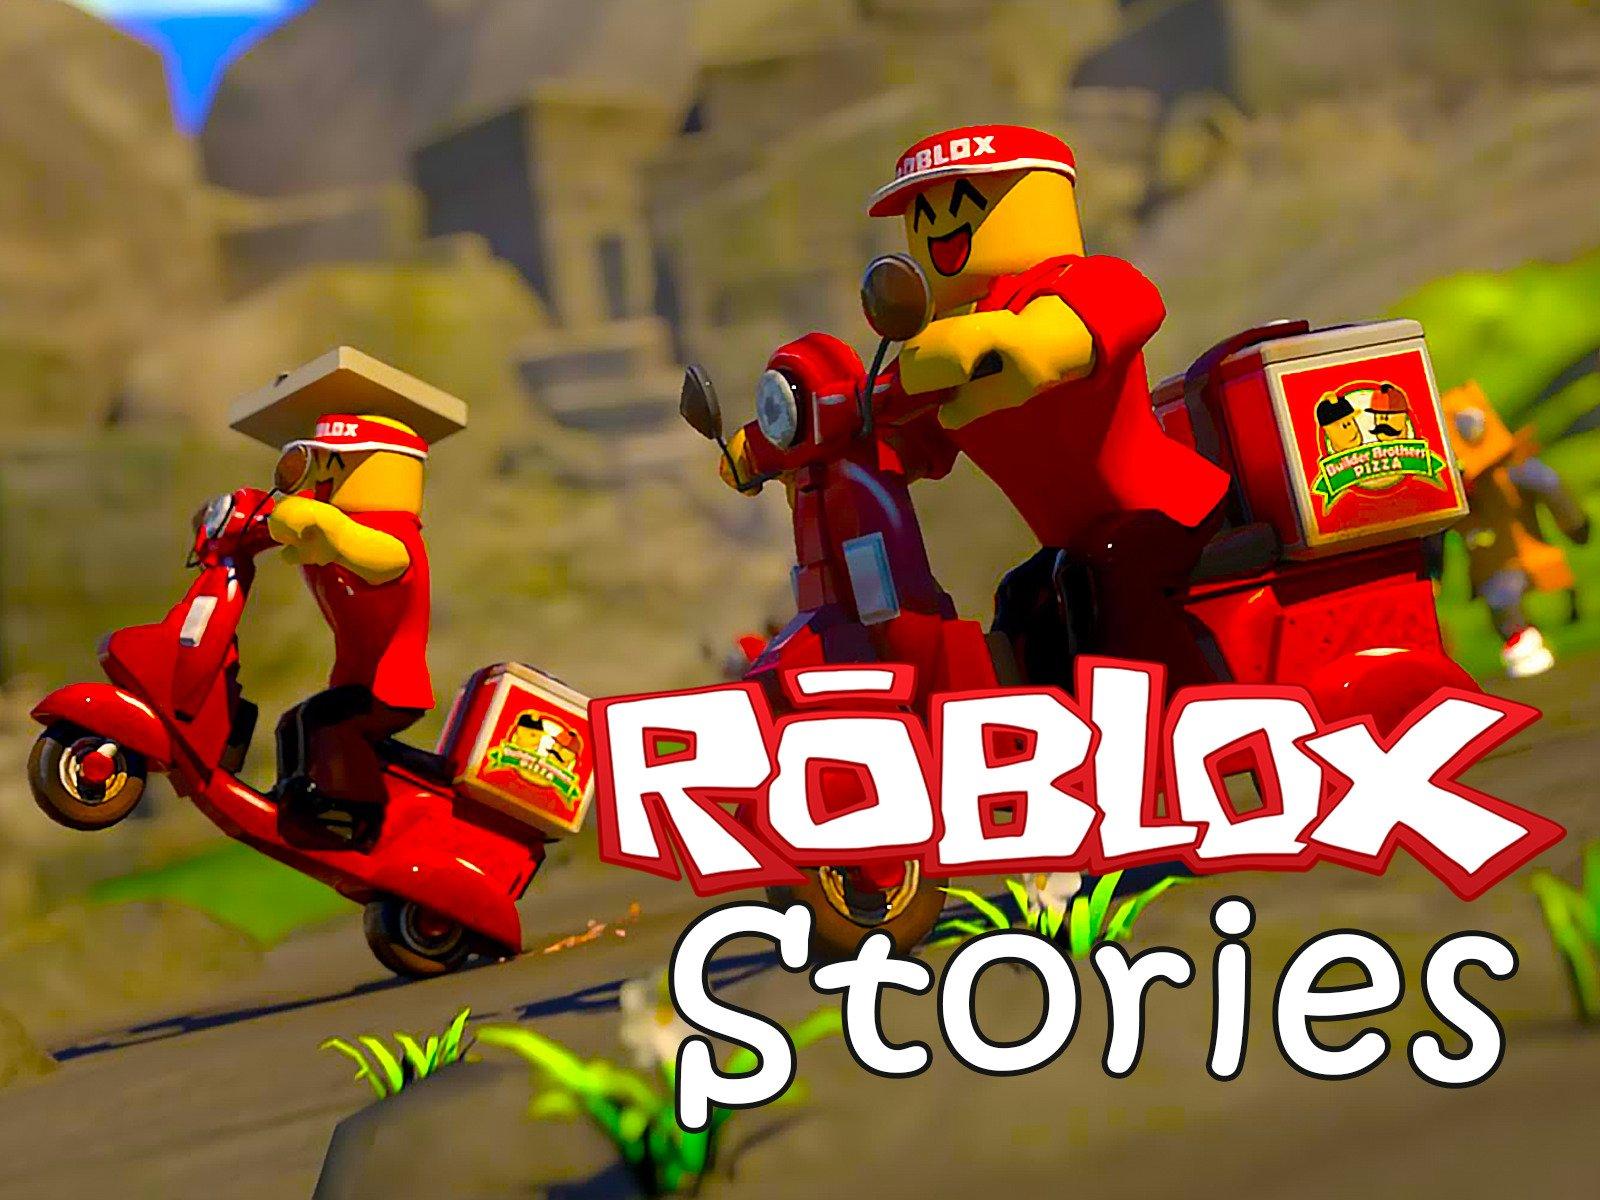 Clip: Roblox Stories - Season 1